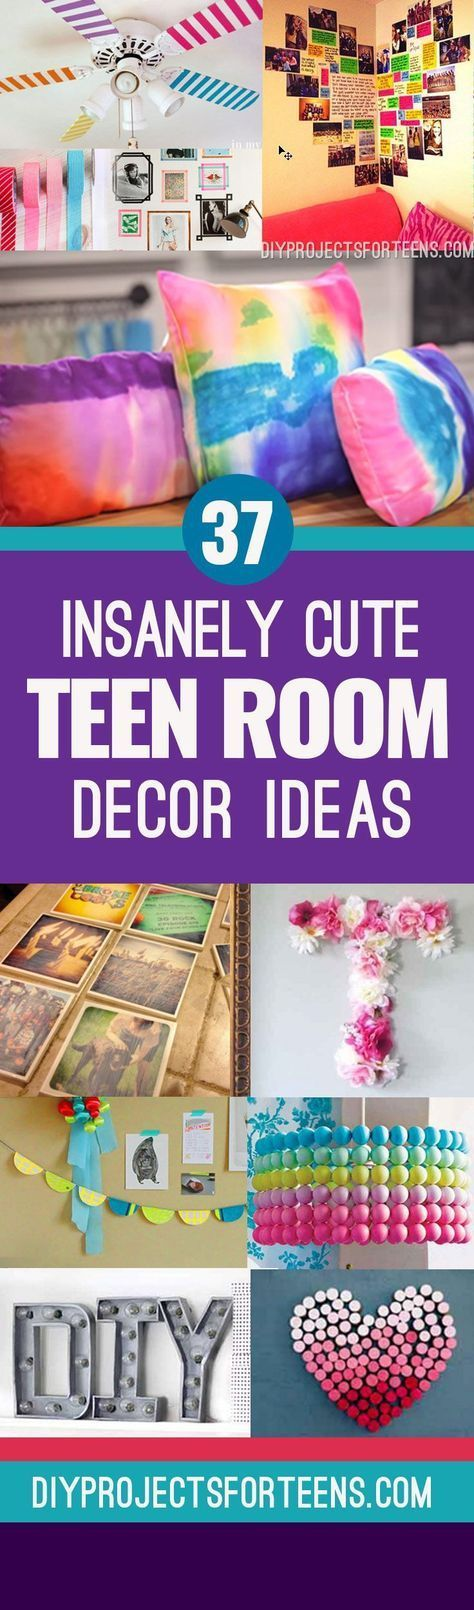 Best 20+ Cute teen bedrooms ideas on Pinterest | Cute room ideas ...